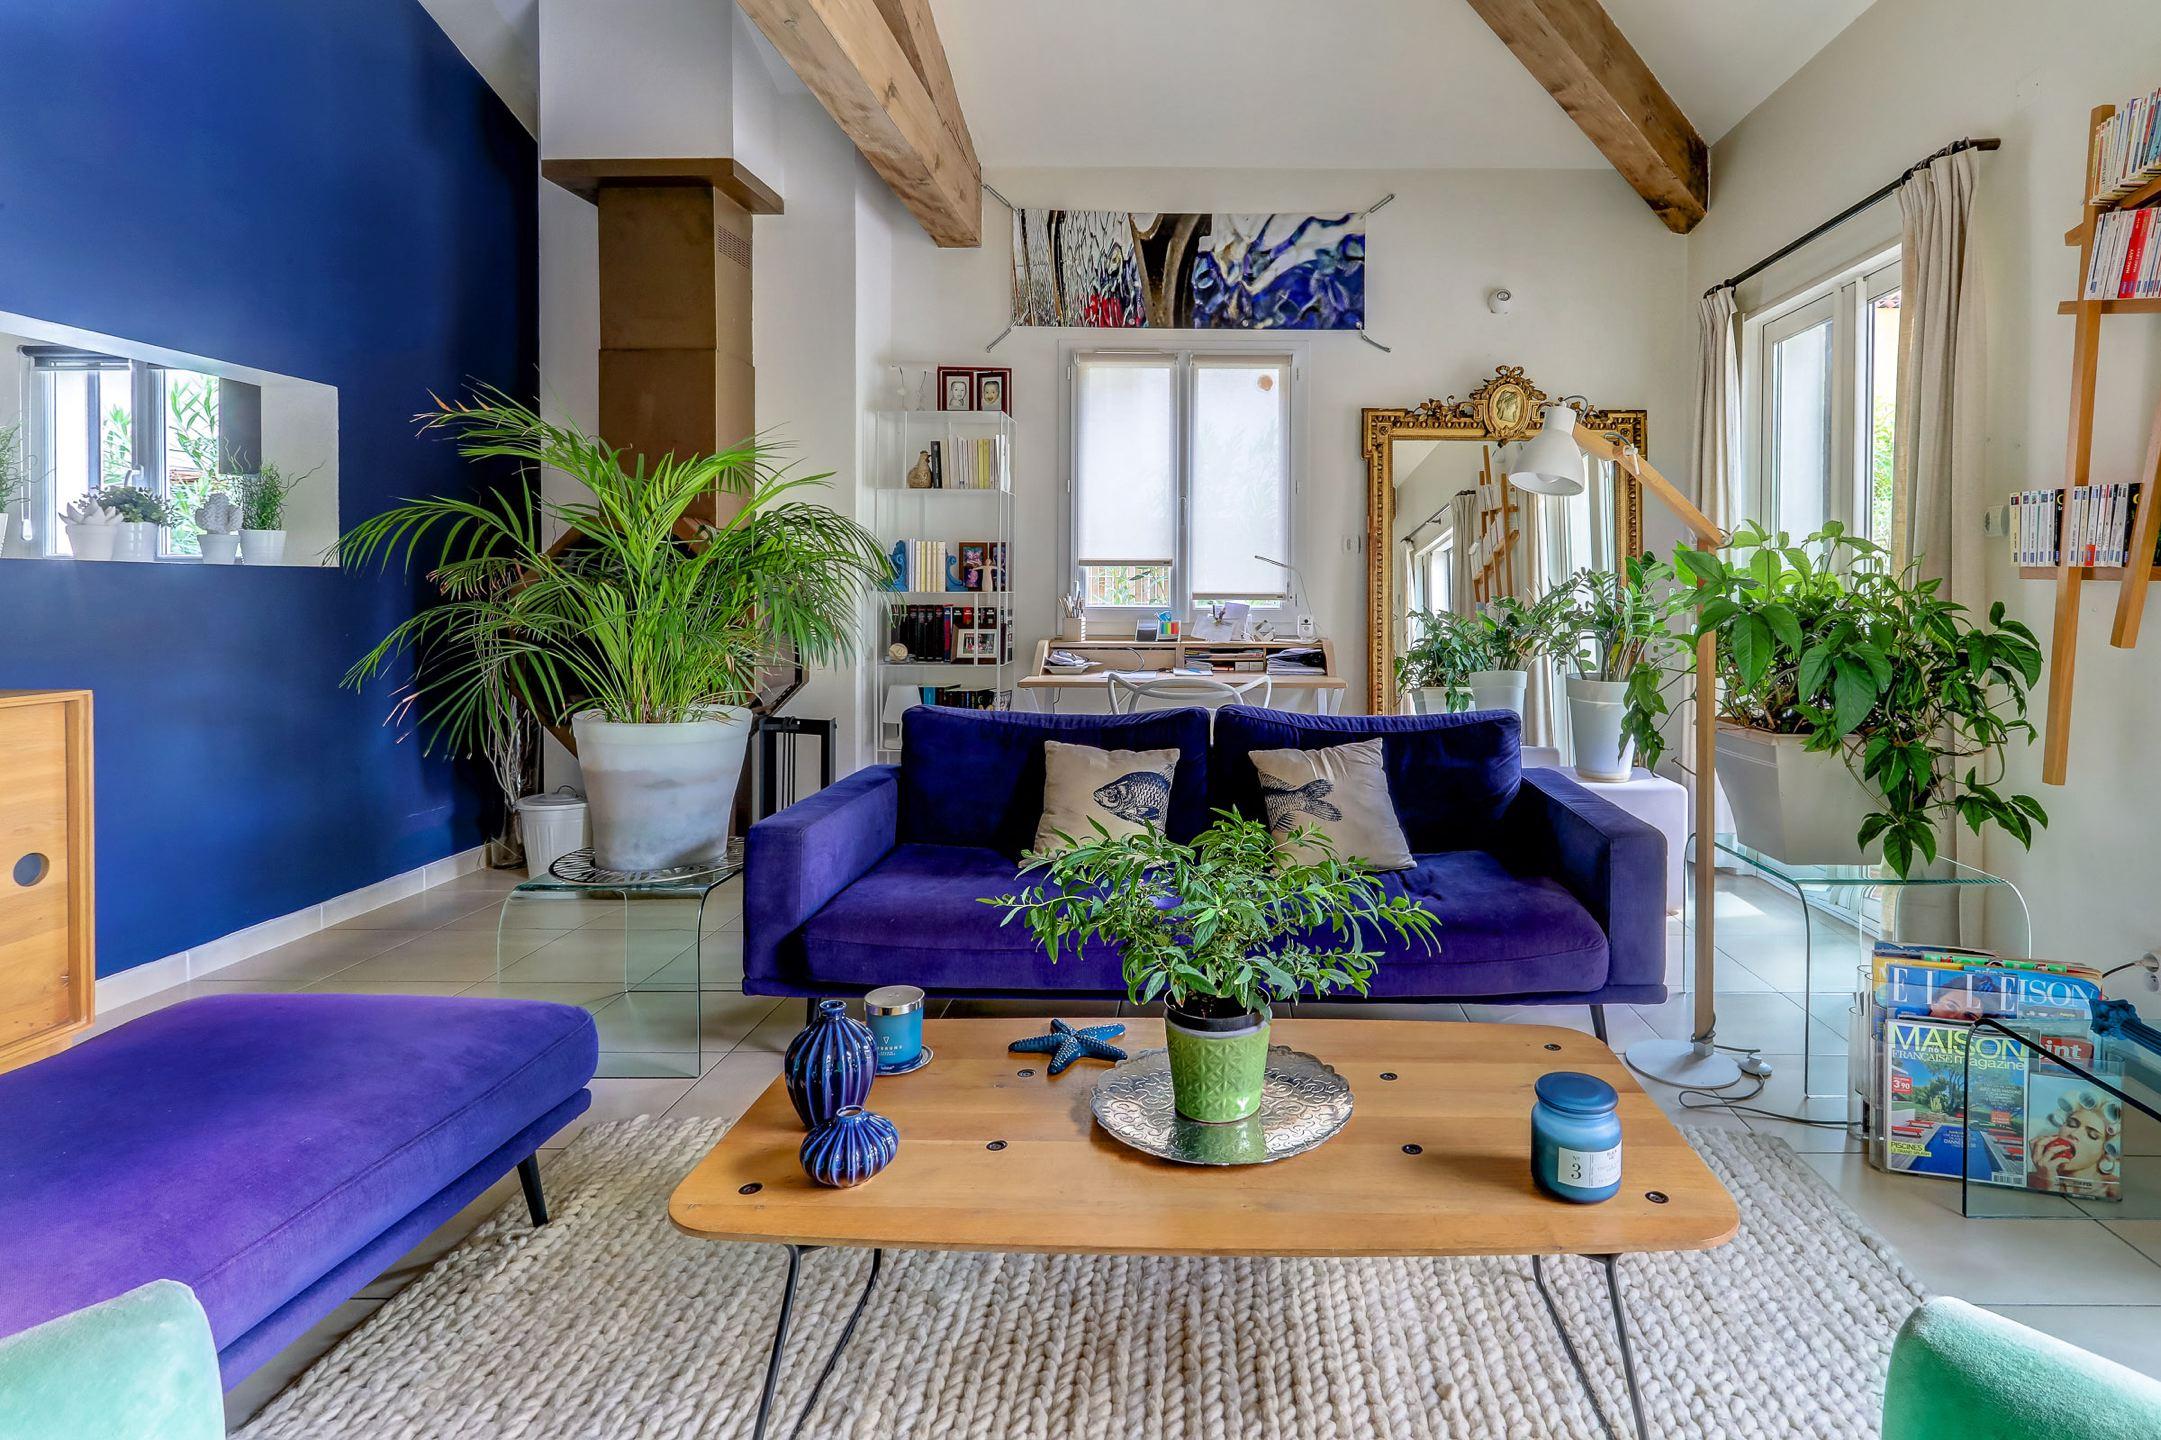 beaumont_13012_villapiscine_teck_contemporaine_terrasse_saintjulien_saintbarnabe_bleuklein_salon